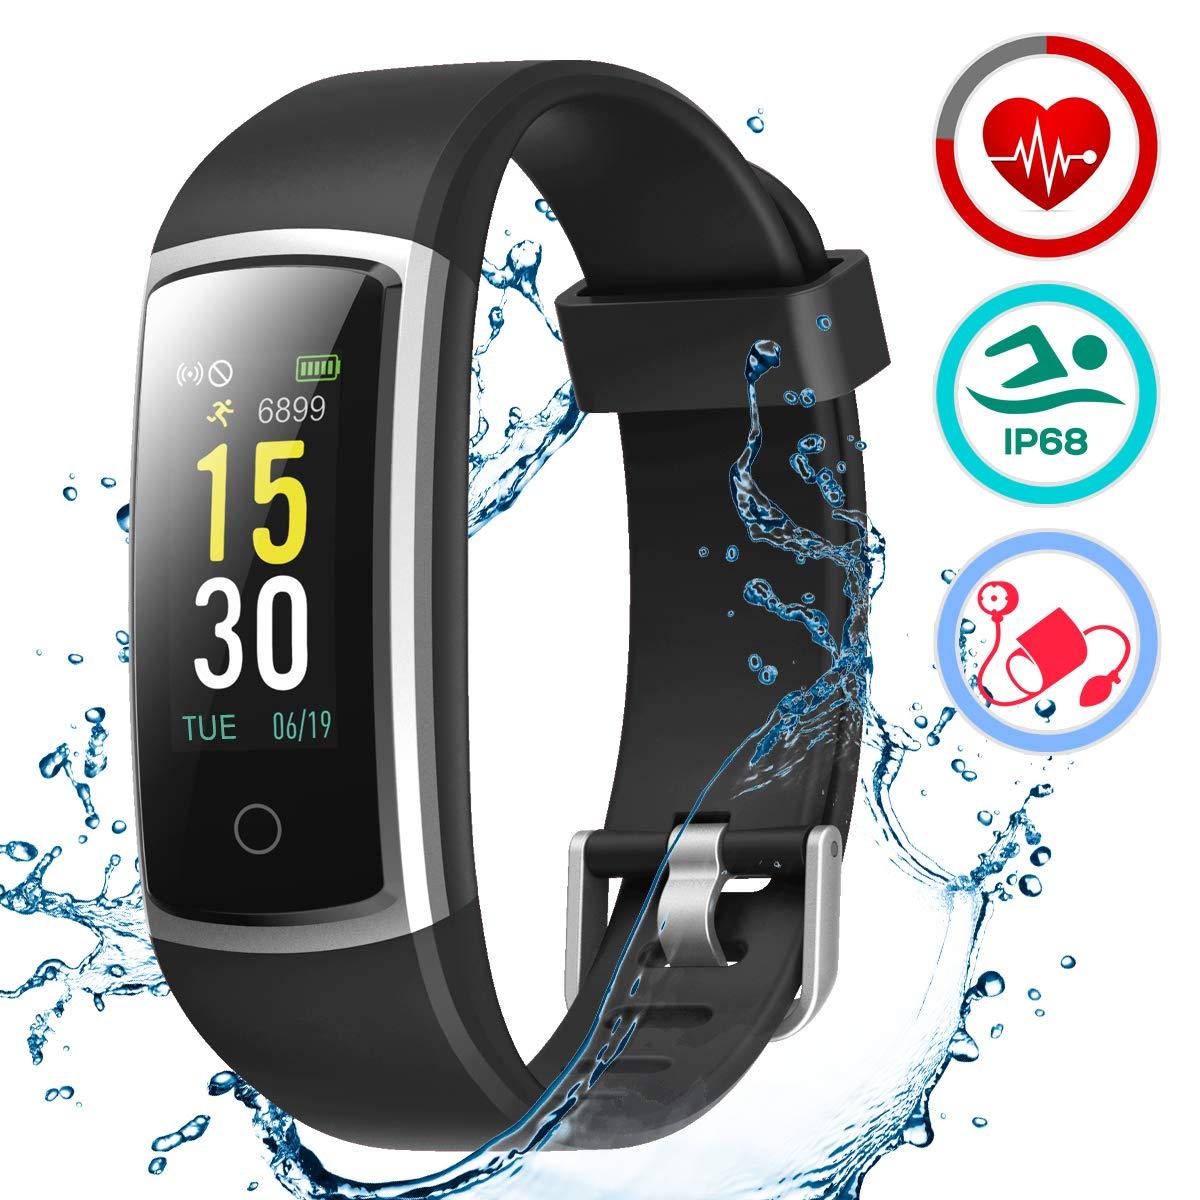 LATEC Fitness Armband mit Pulsmesser, IP68 Wasserdicht Fitness Trackers Farbbildschirm Aktivitätstracker Fitness Uhr Smartwatch